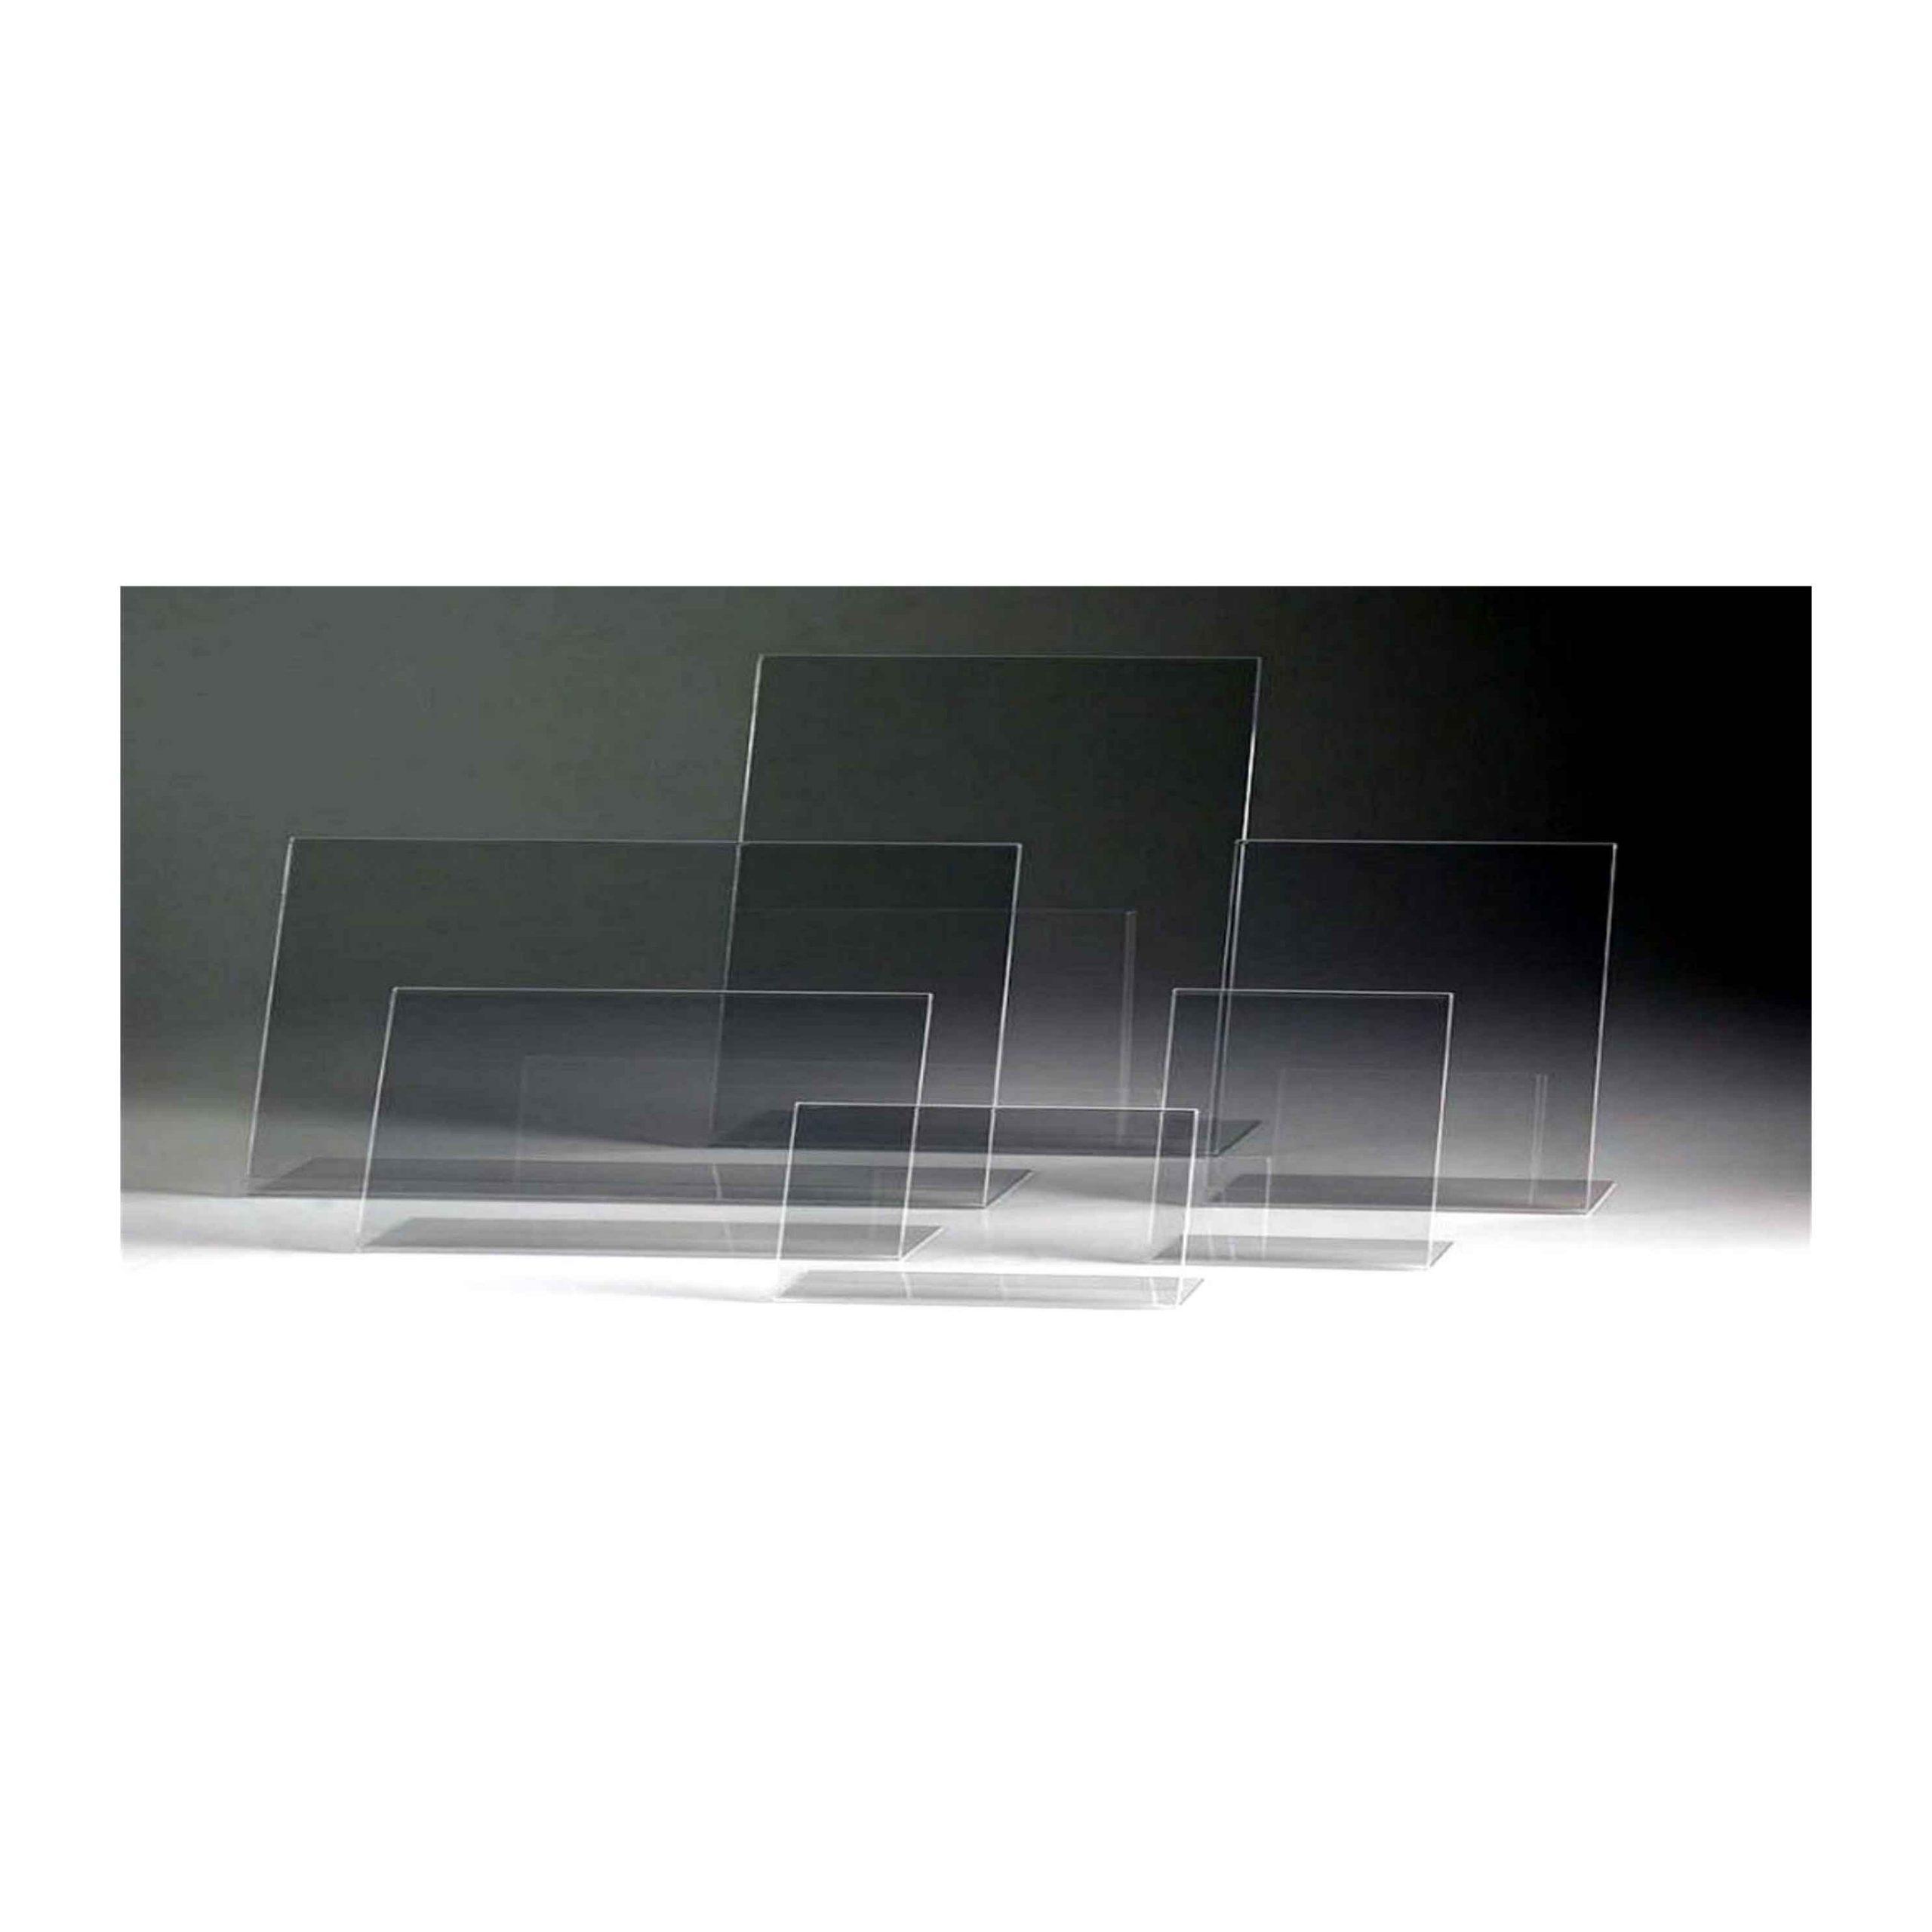 PMMA_XT_INCOLORE_ANTI_REFLETS_REF_6490_SEMI_RIGIDE_BSB_CAOUTCHOUCS_PLASTIQUES